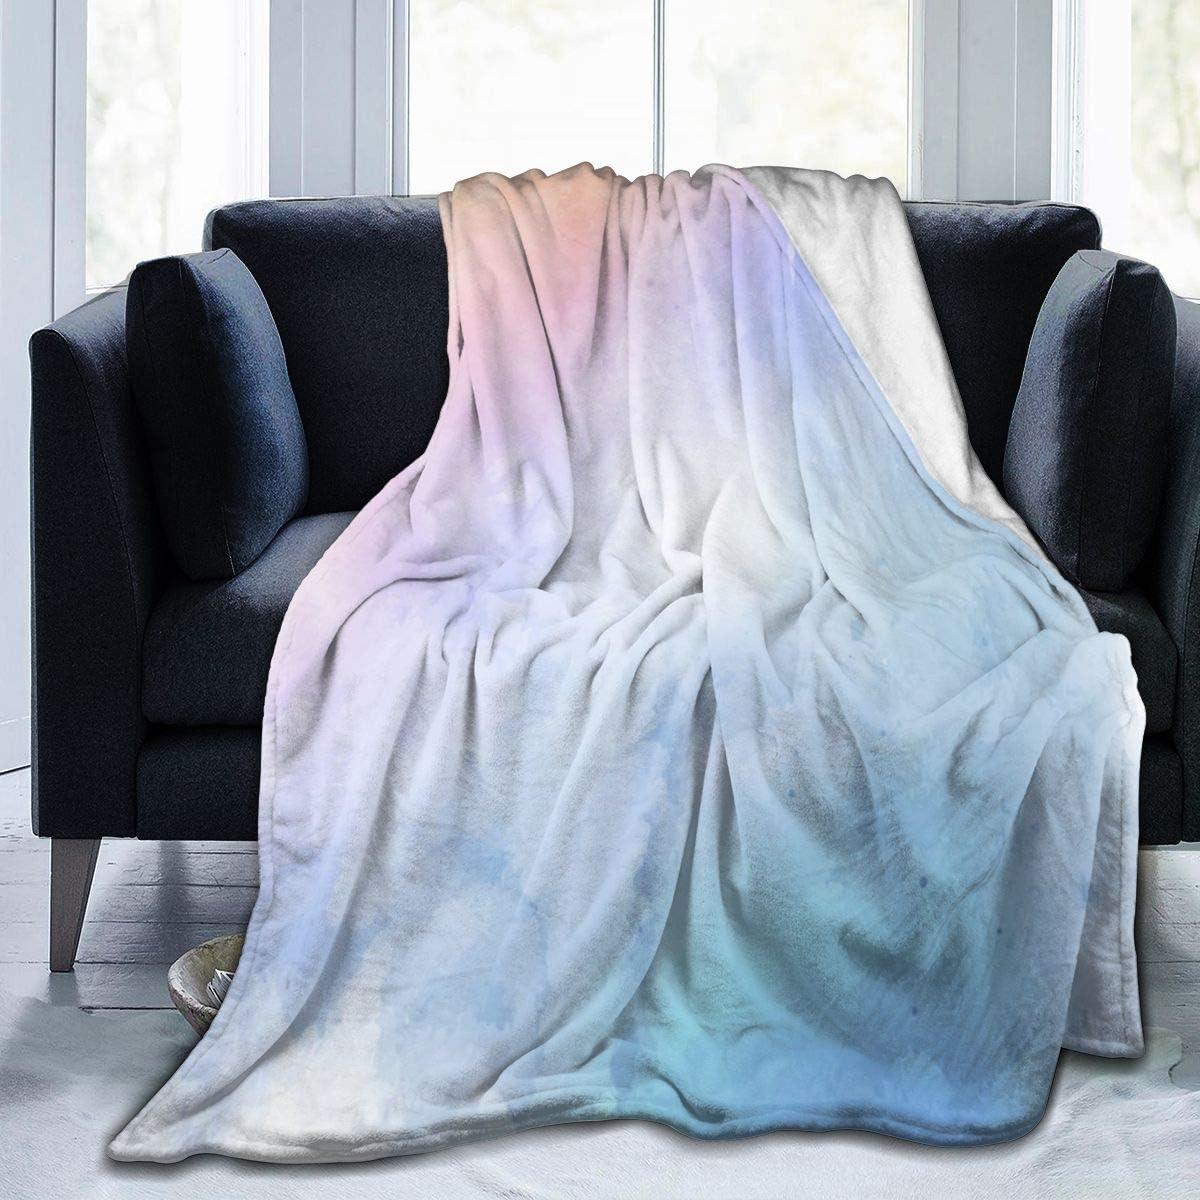 Amazon Com Sherpa Blanket Pastel Grunge Flannel Comfortable Fleece Blanket Reversible Couch Blanket Lightweight Warm Sofa Blanket For Kids Adults 50 X40 Home Kitchen